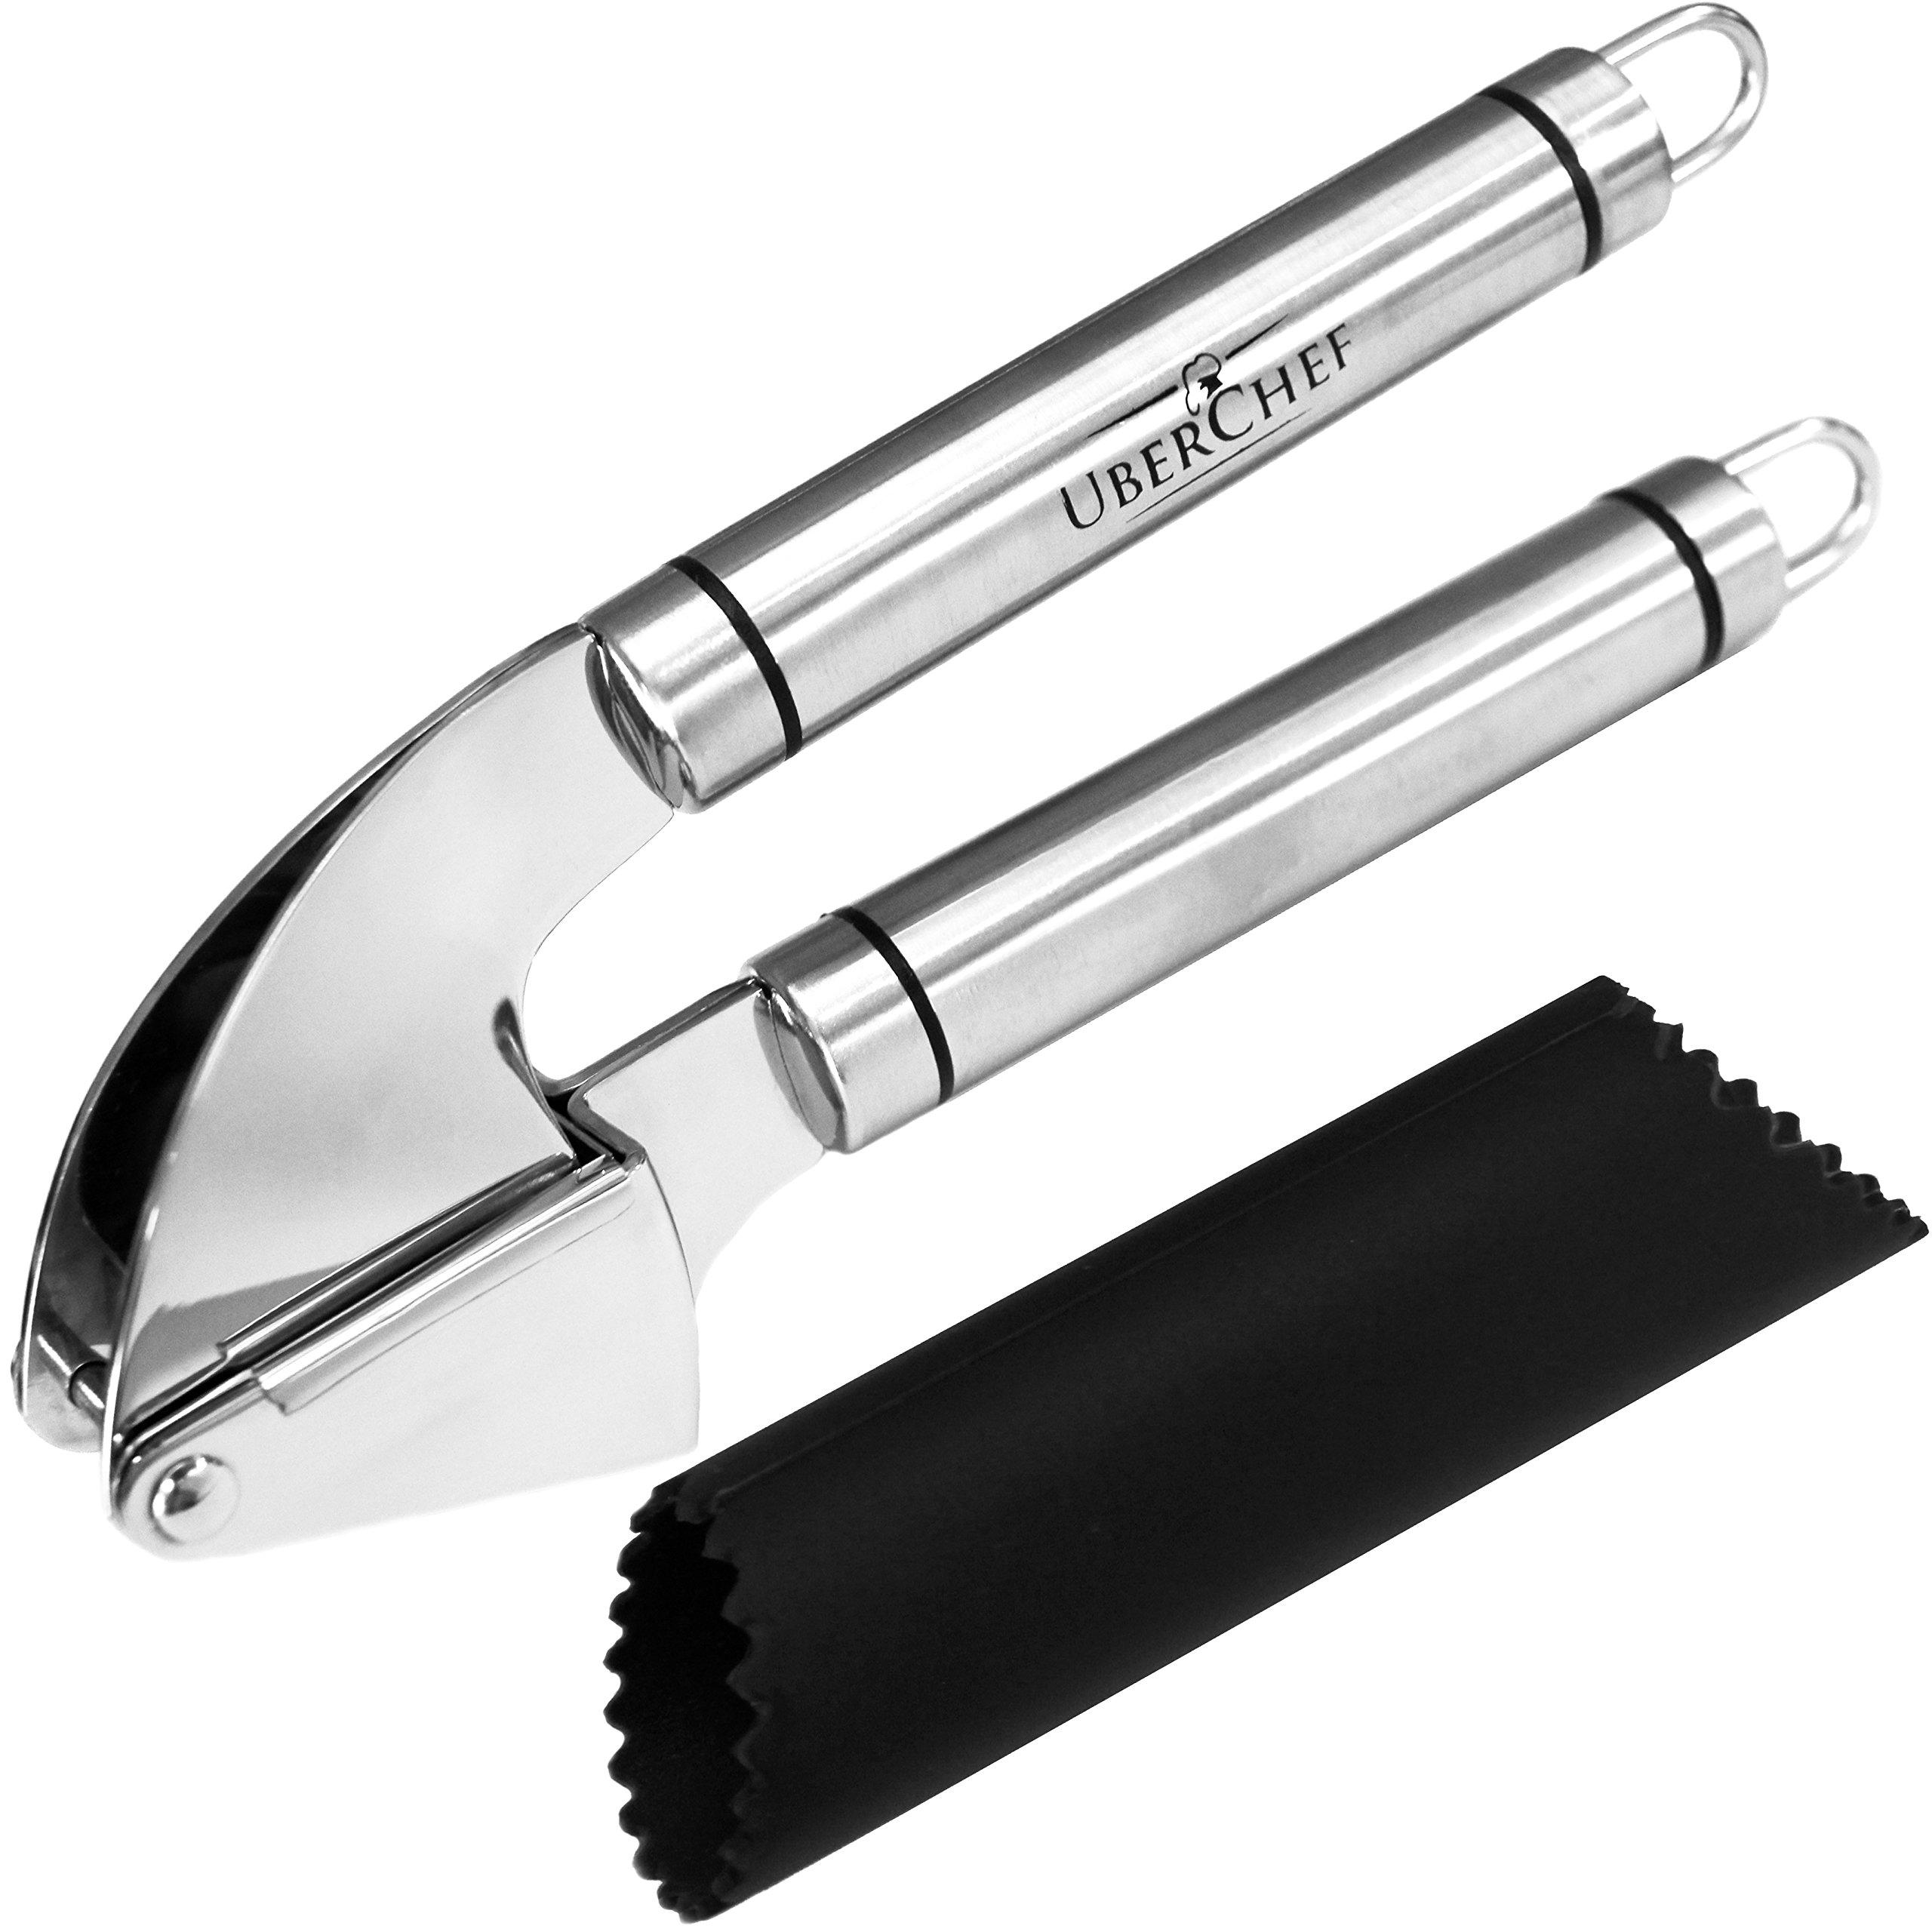 Uberchef Premium Stainless Steel Garlic Press & Peeler Set Mince & Crush Gar.. 18